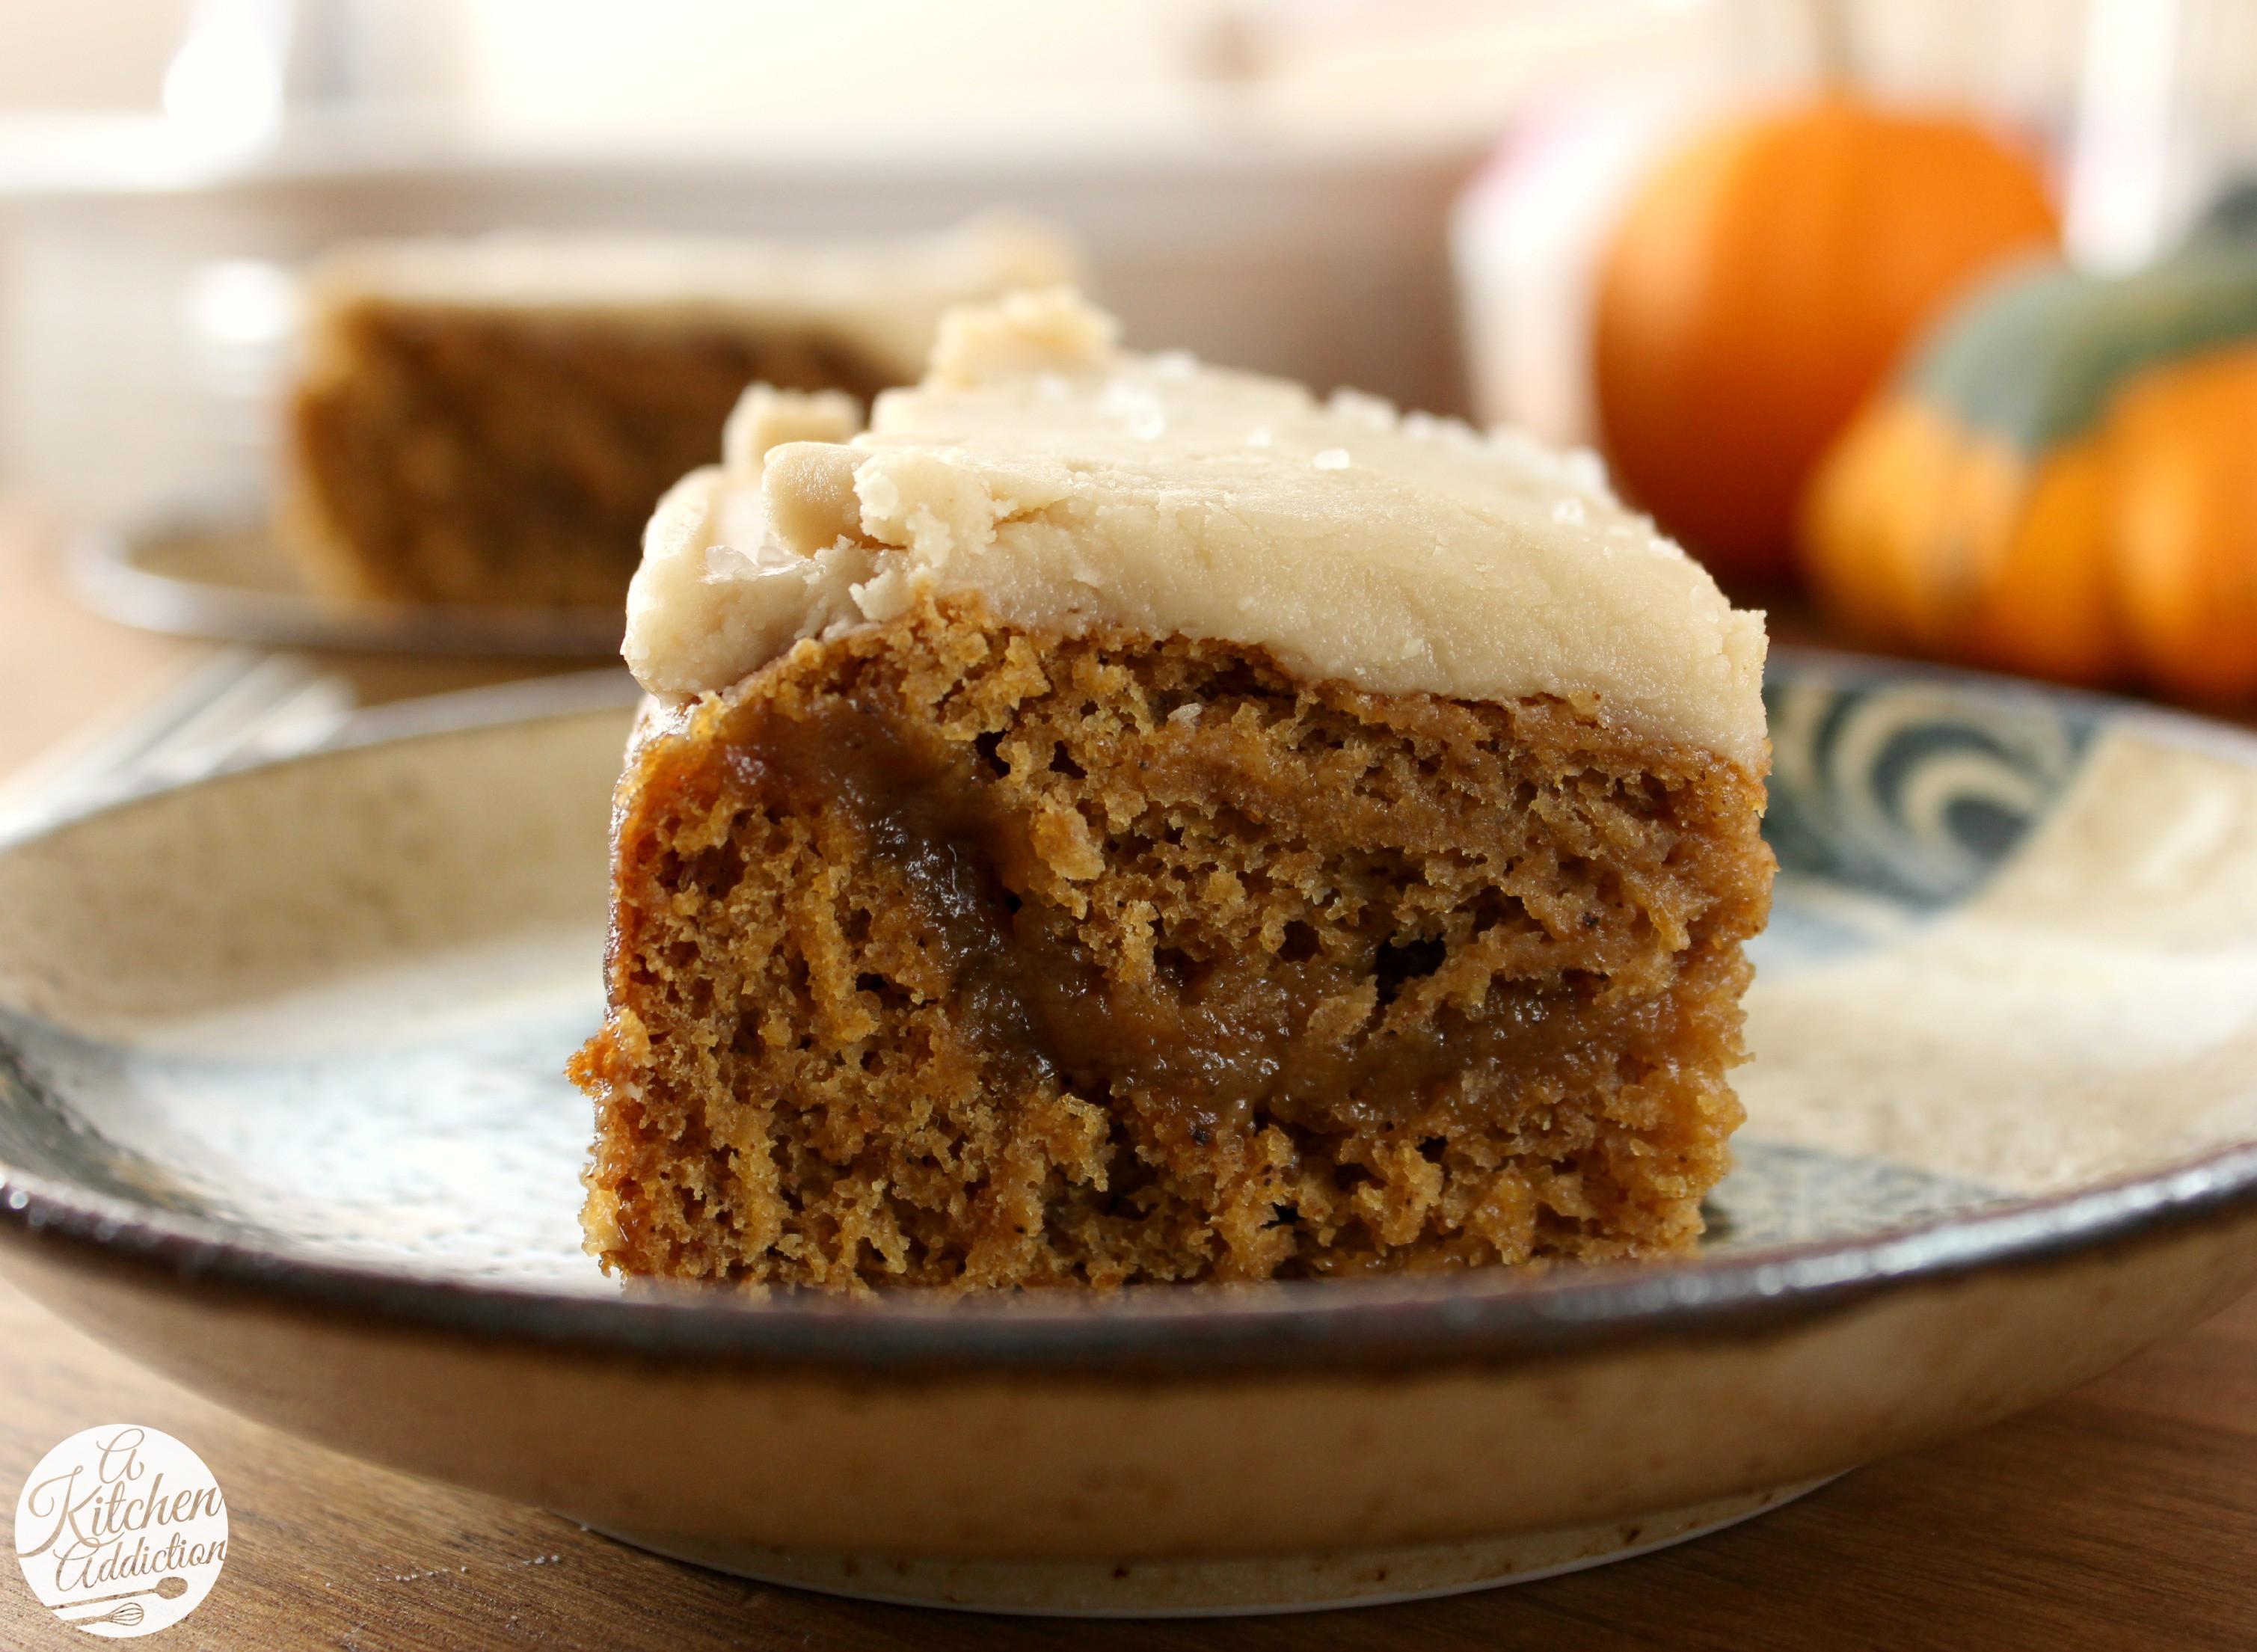 Pumpkin Cake Recipe  Salted Caramel Pumpkin Cake A Kitchen Addiction